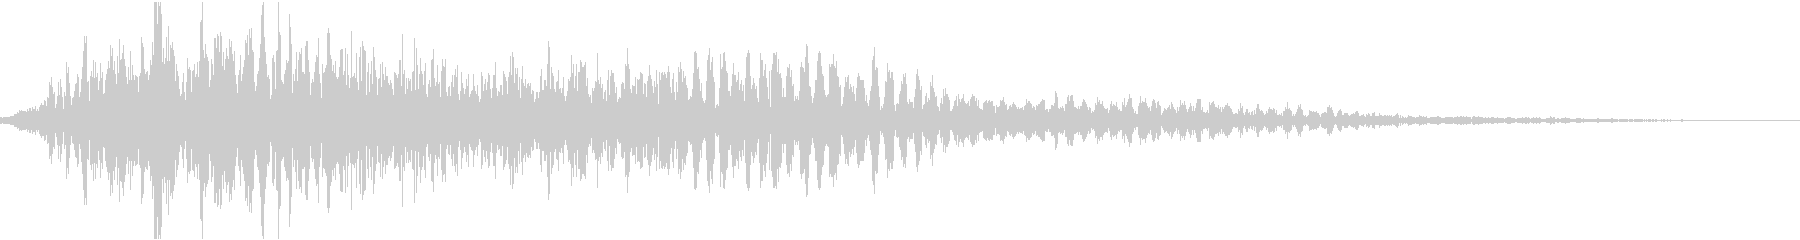 CINEMATIC SFX_14の未再生の波形